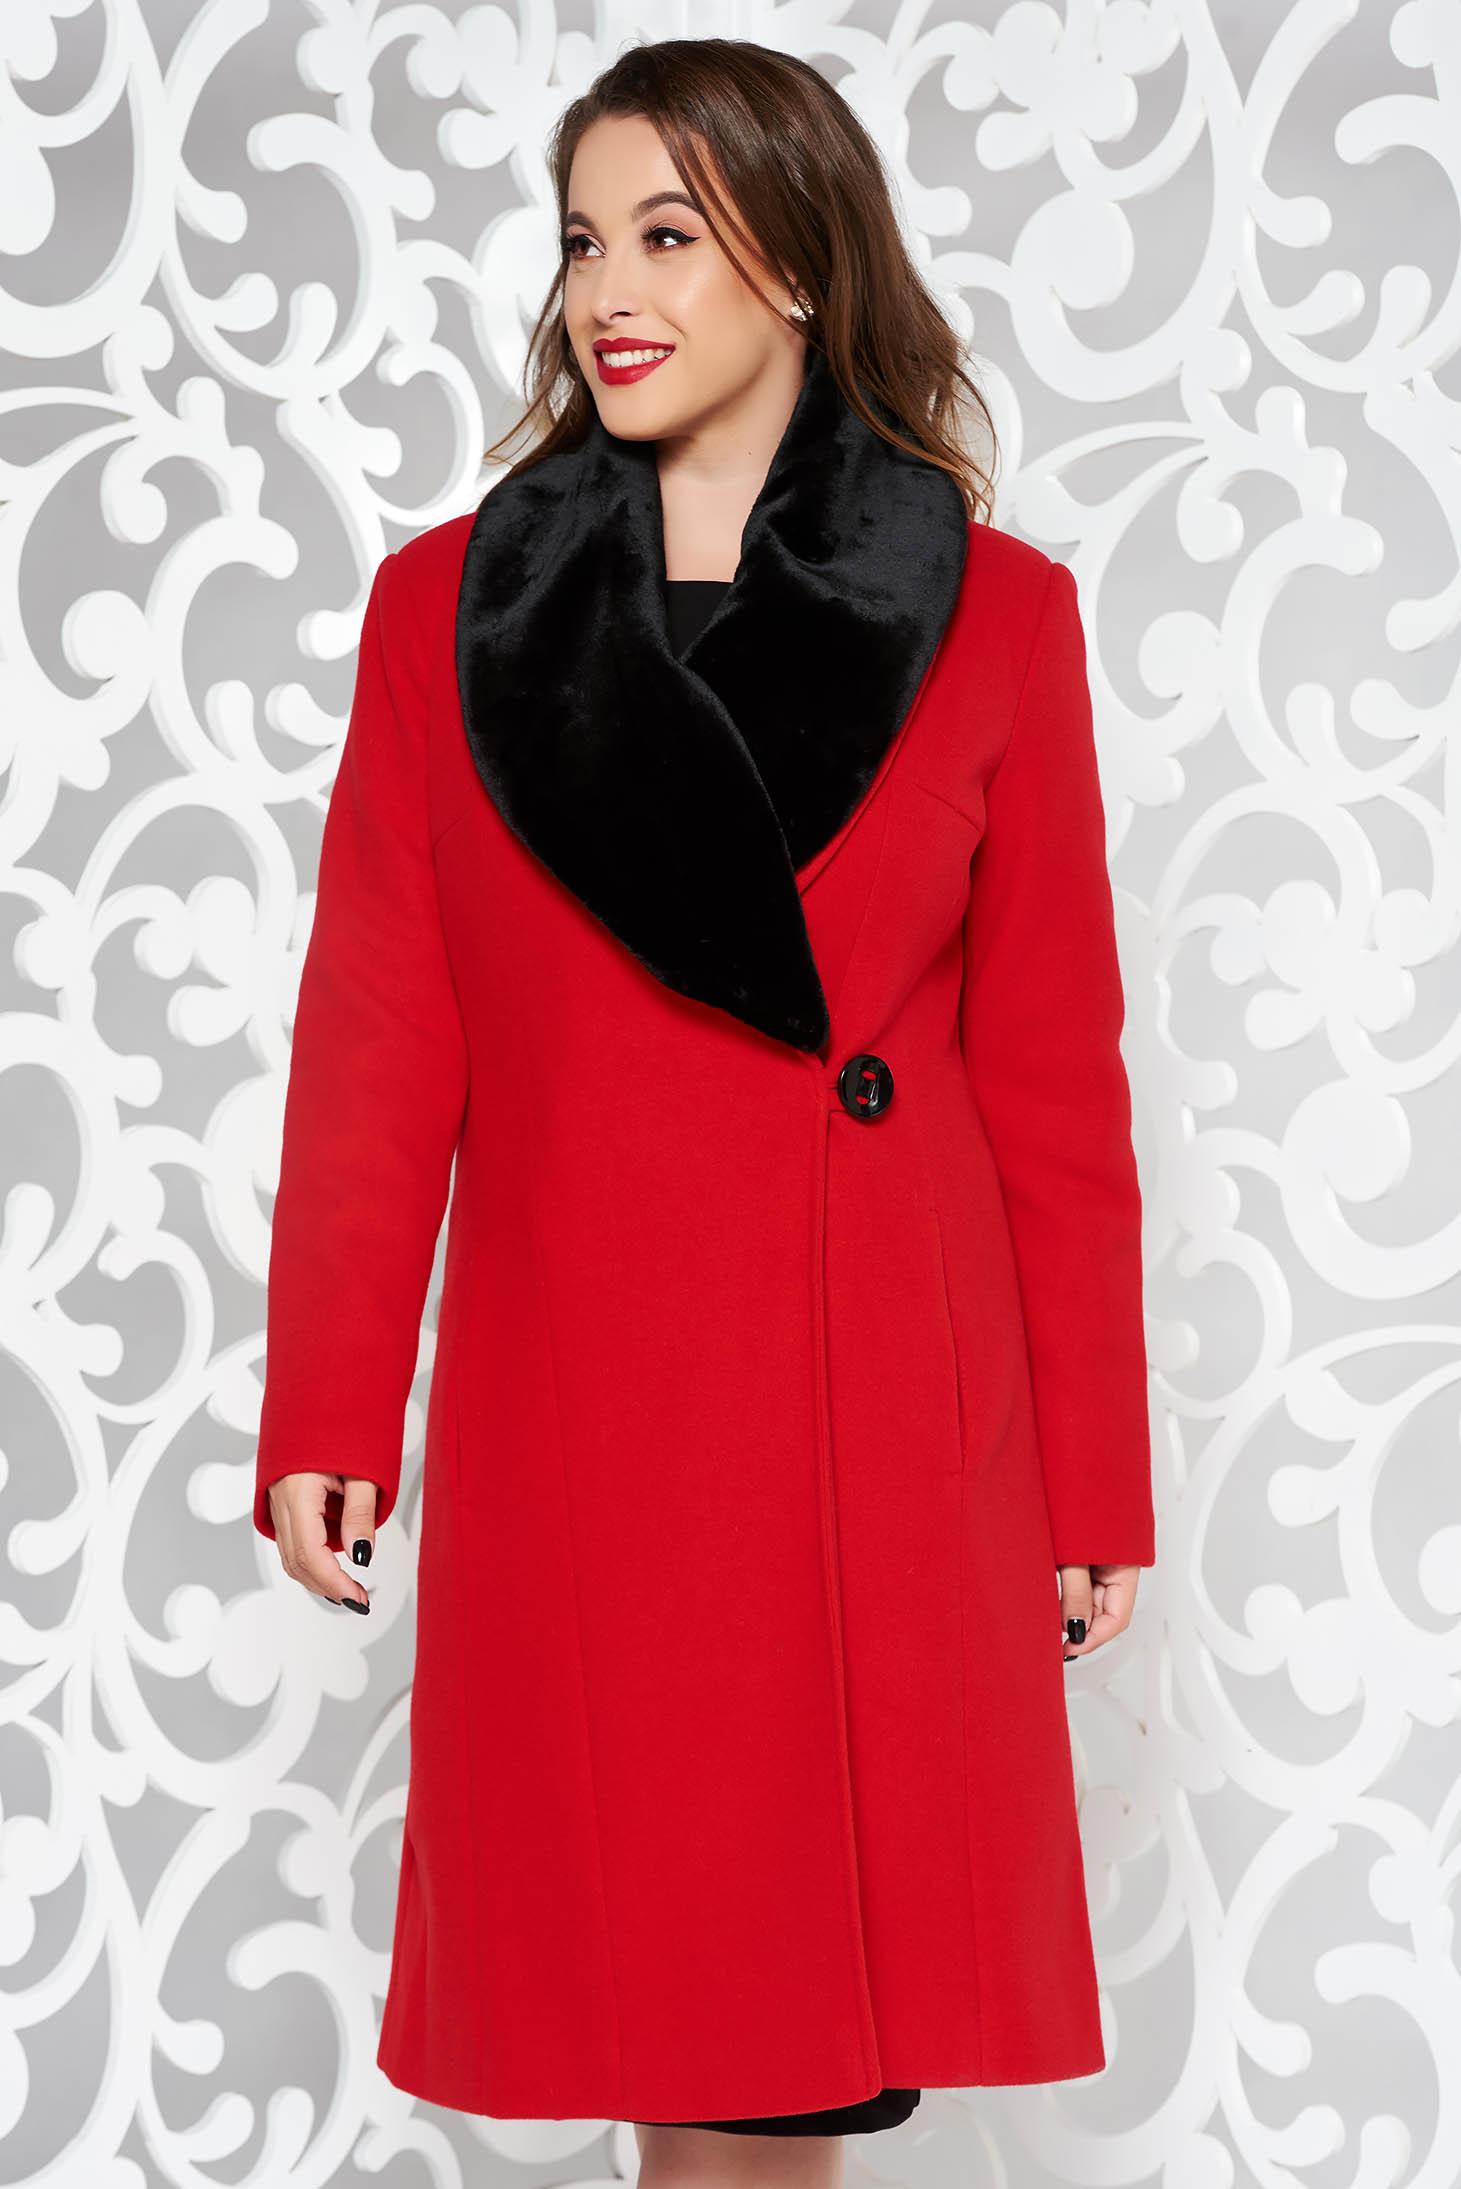 LaDonna red elegant wool coat arched cut fur collar